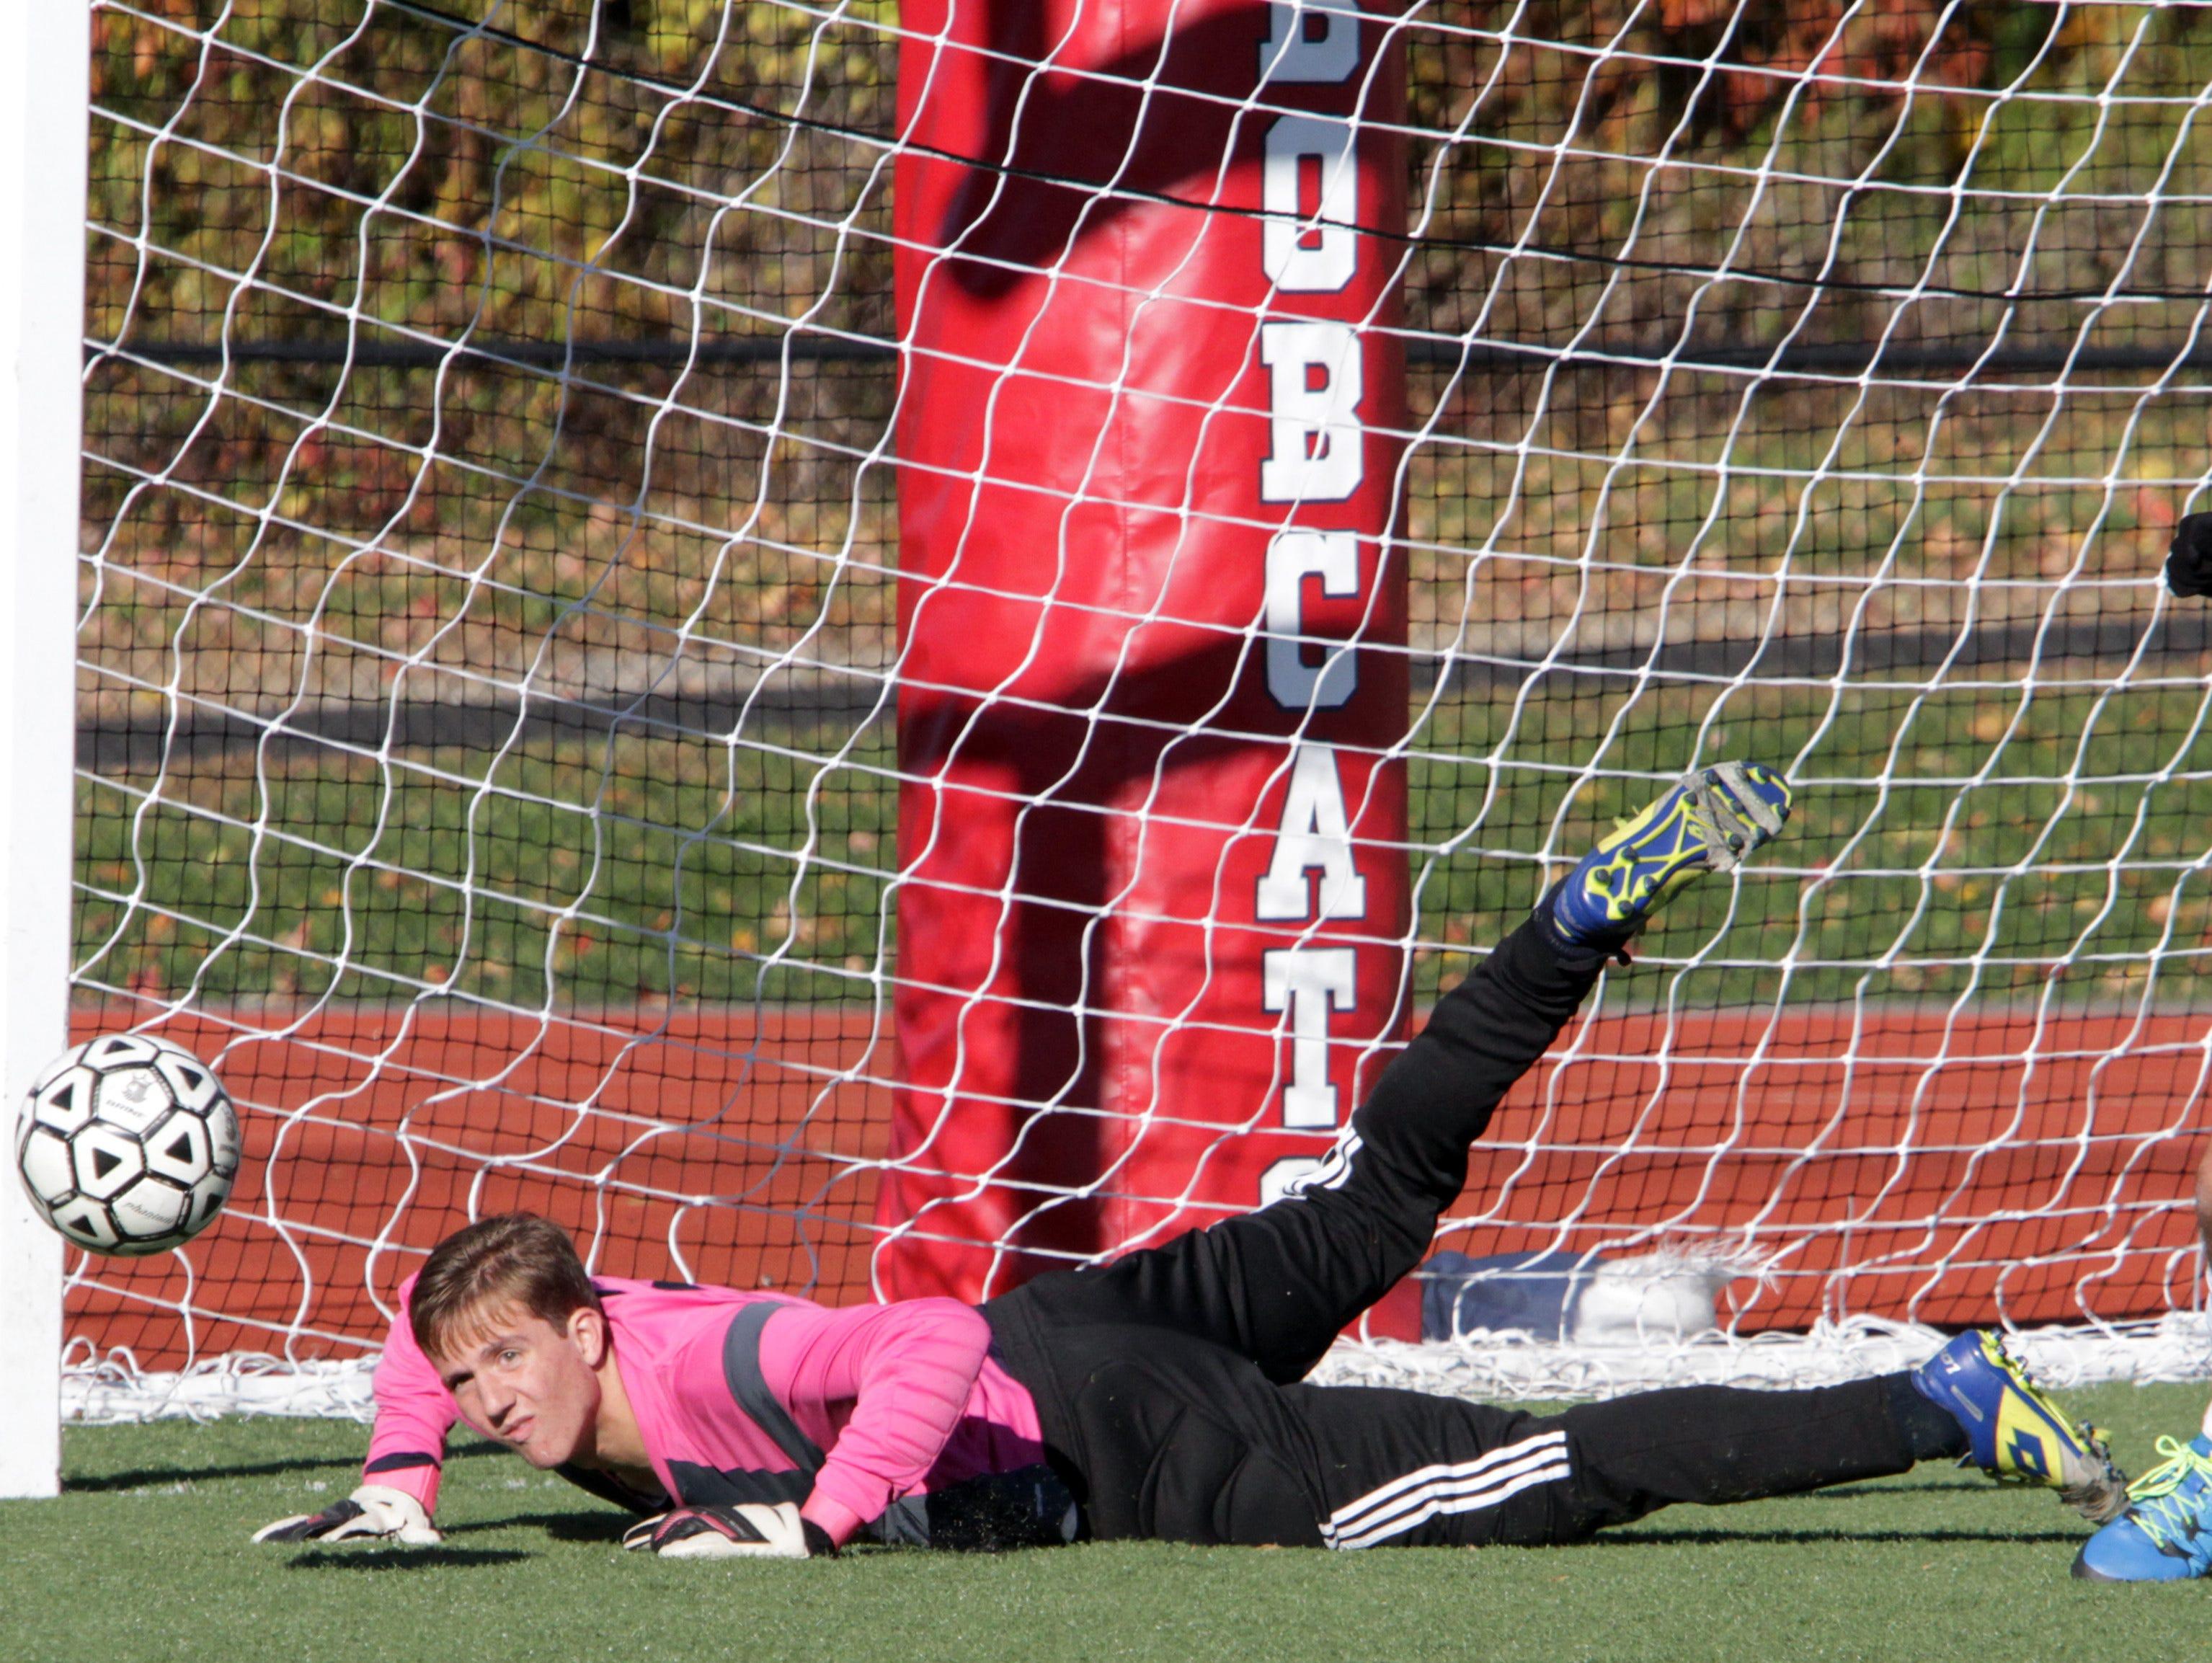 Pelham's goalie Matthew O'Neil dives for a wide shot kicked by Byram Hills' Garrett Wolfe during their boys soccer quarterfinal Class A game at Byram Hoills High School in Armonk Oct. 26, 2015.